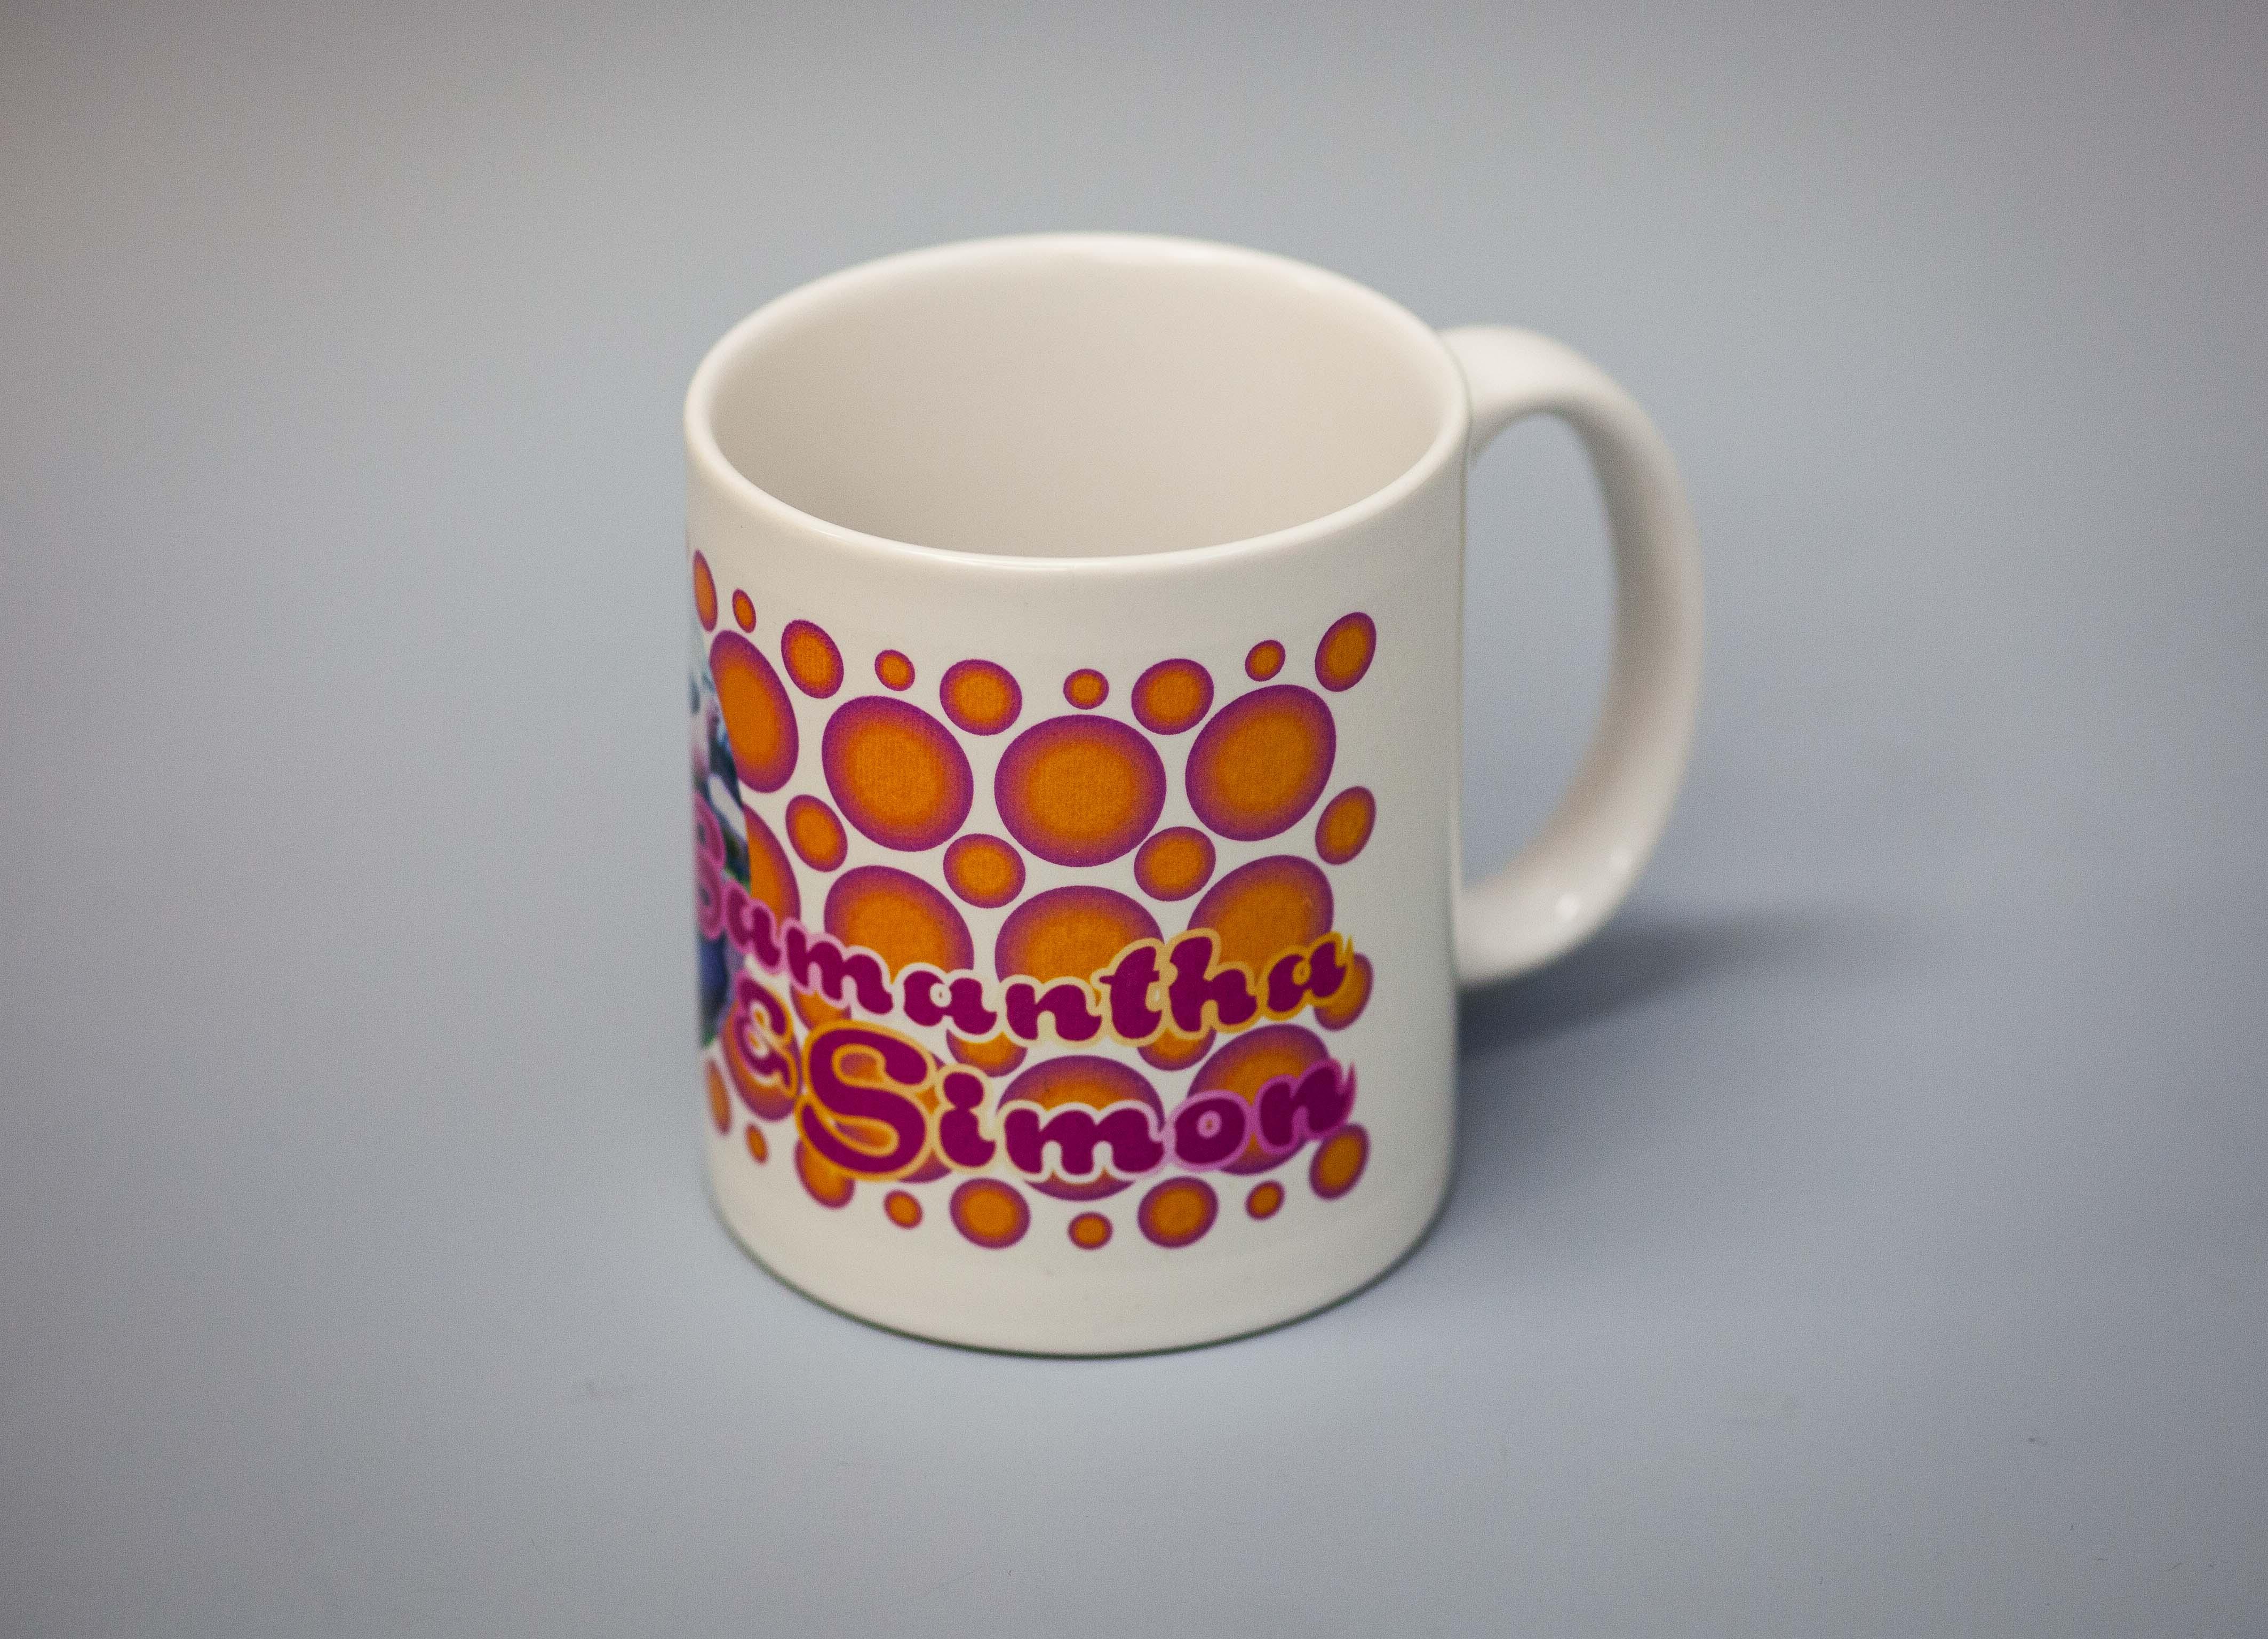 Designed and printed white mug